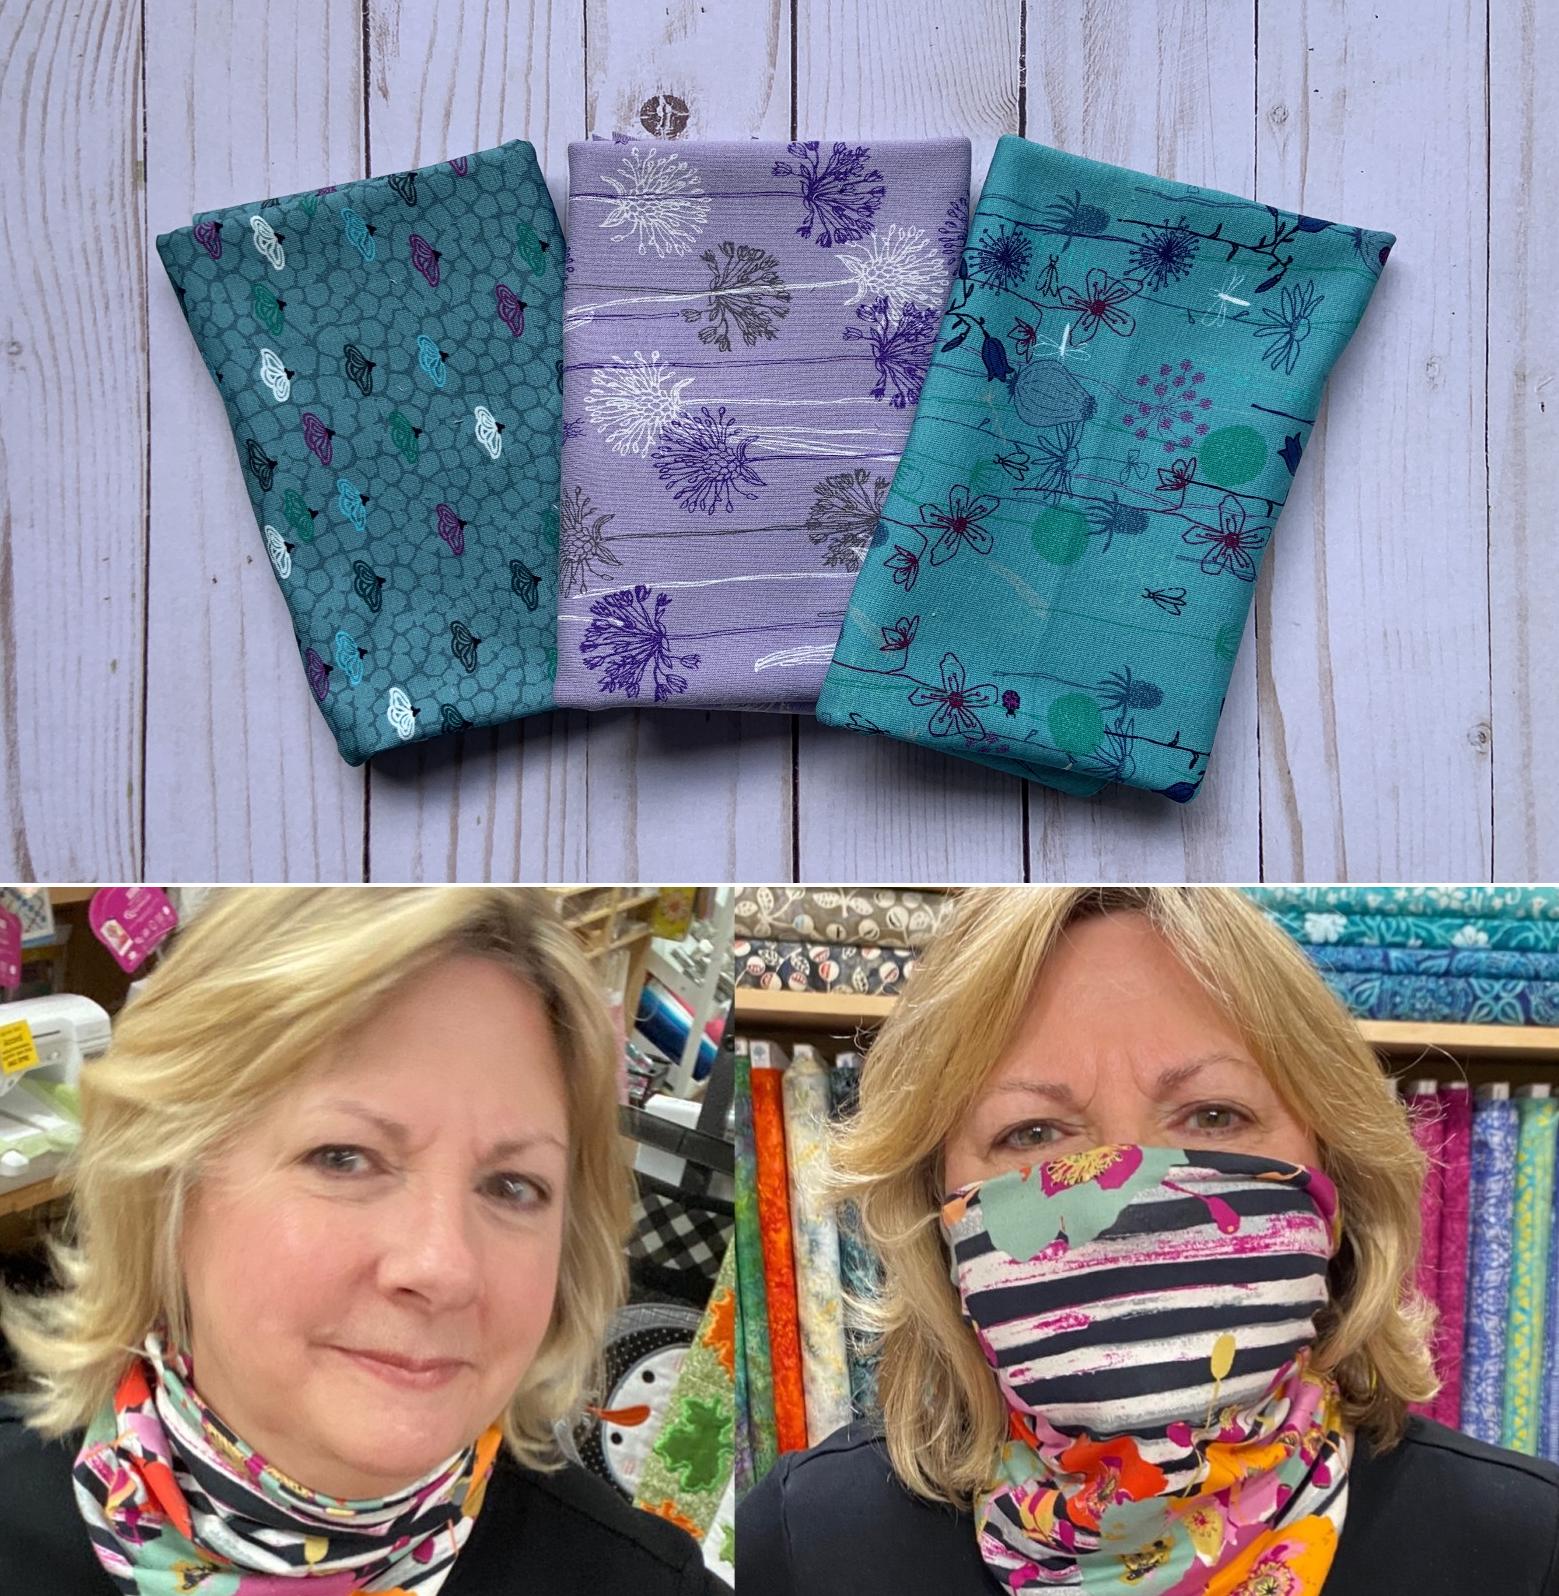 Lavender Dreams NEW! - Gloria Gaiter Face Covering Kit (Makes 3)